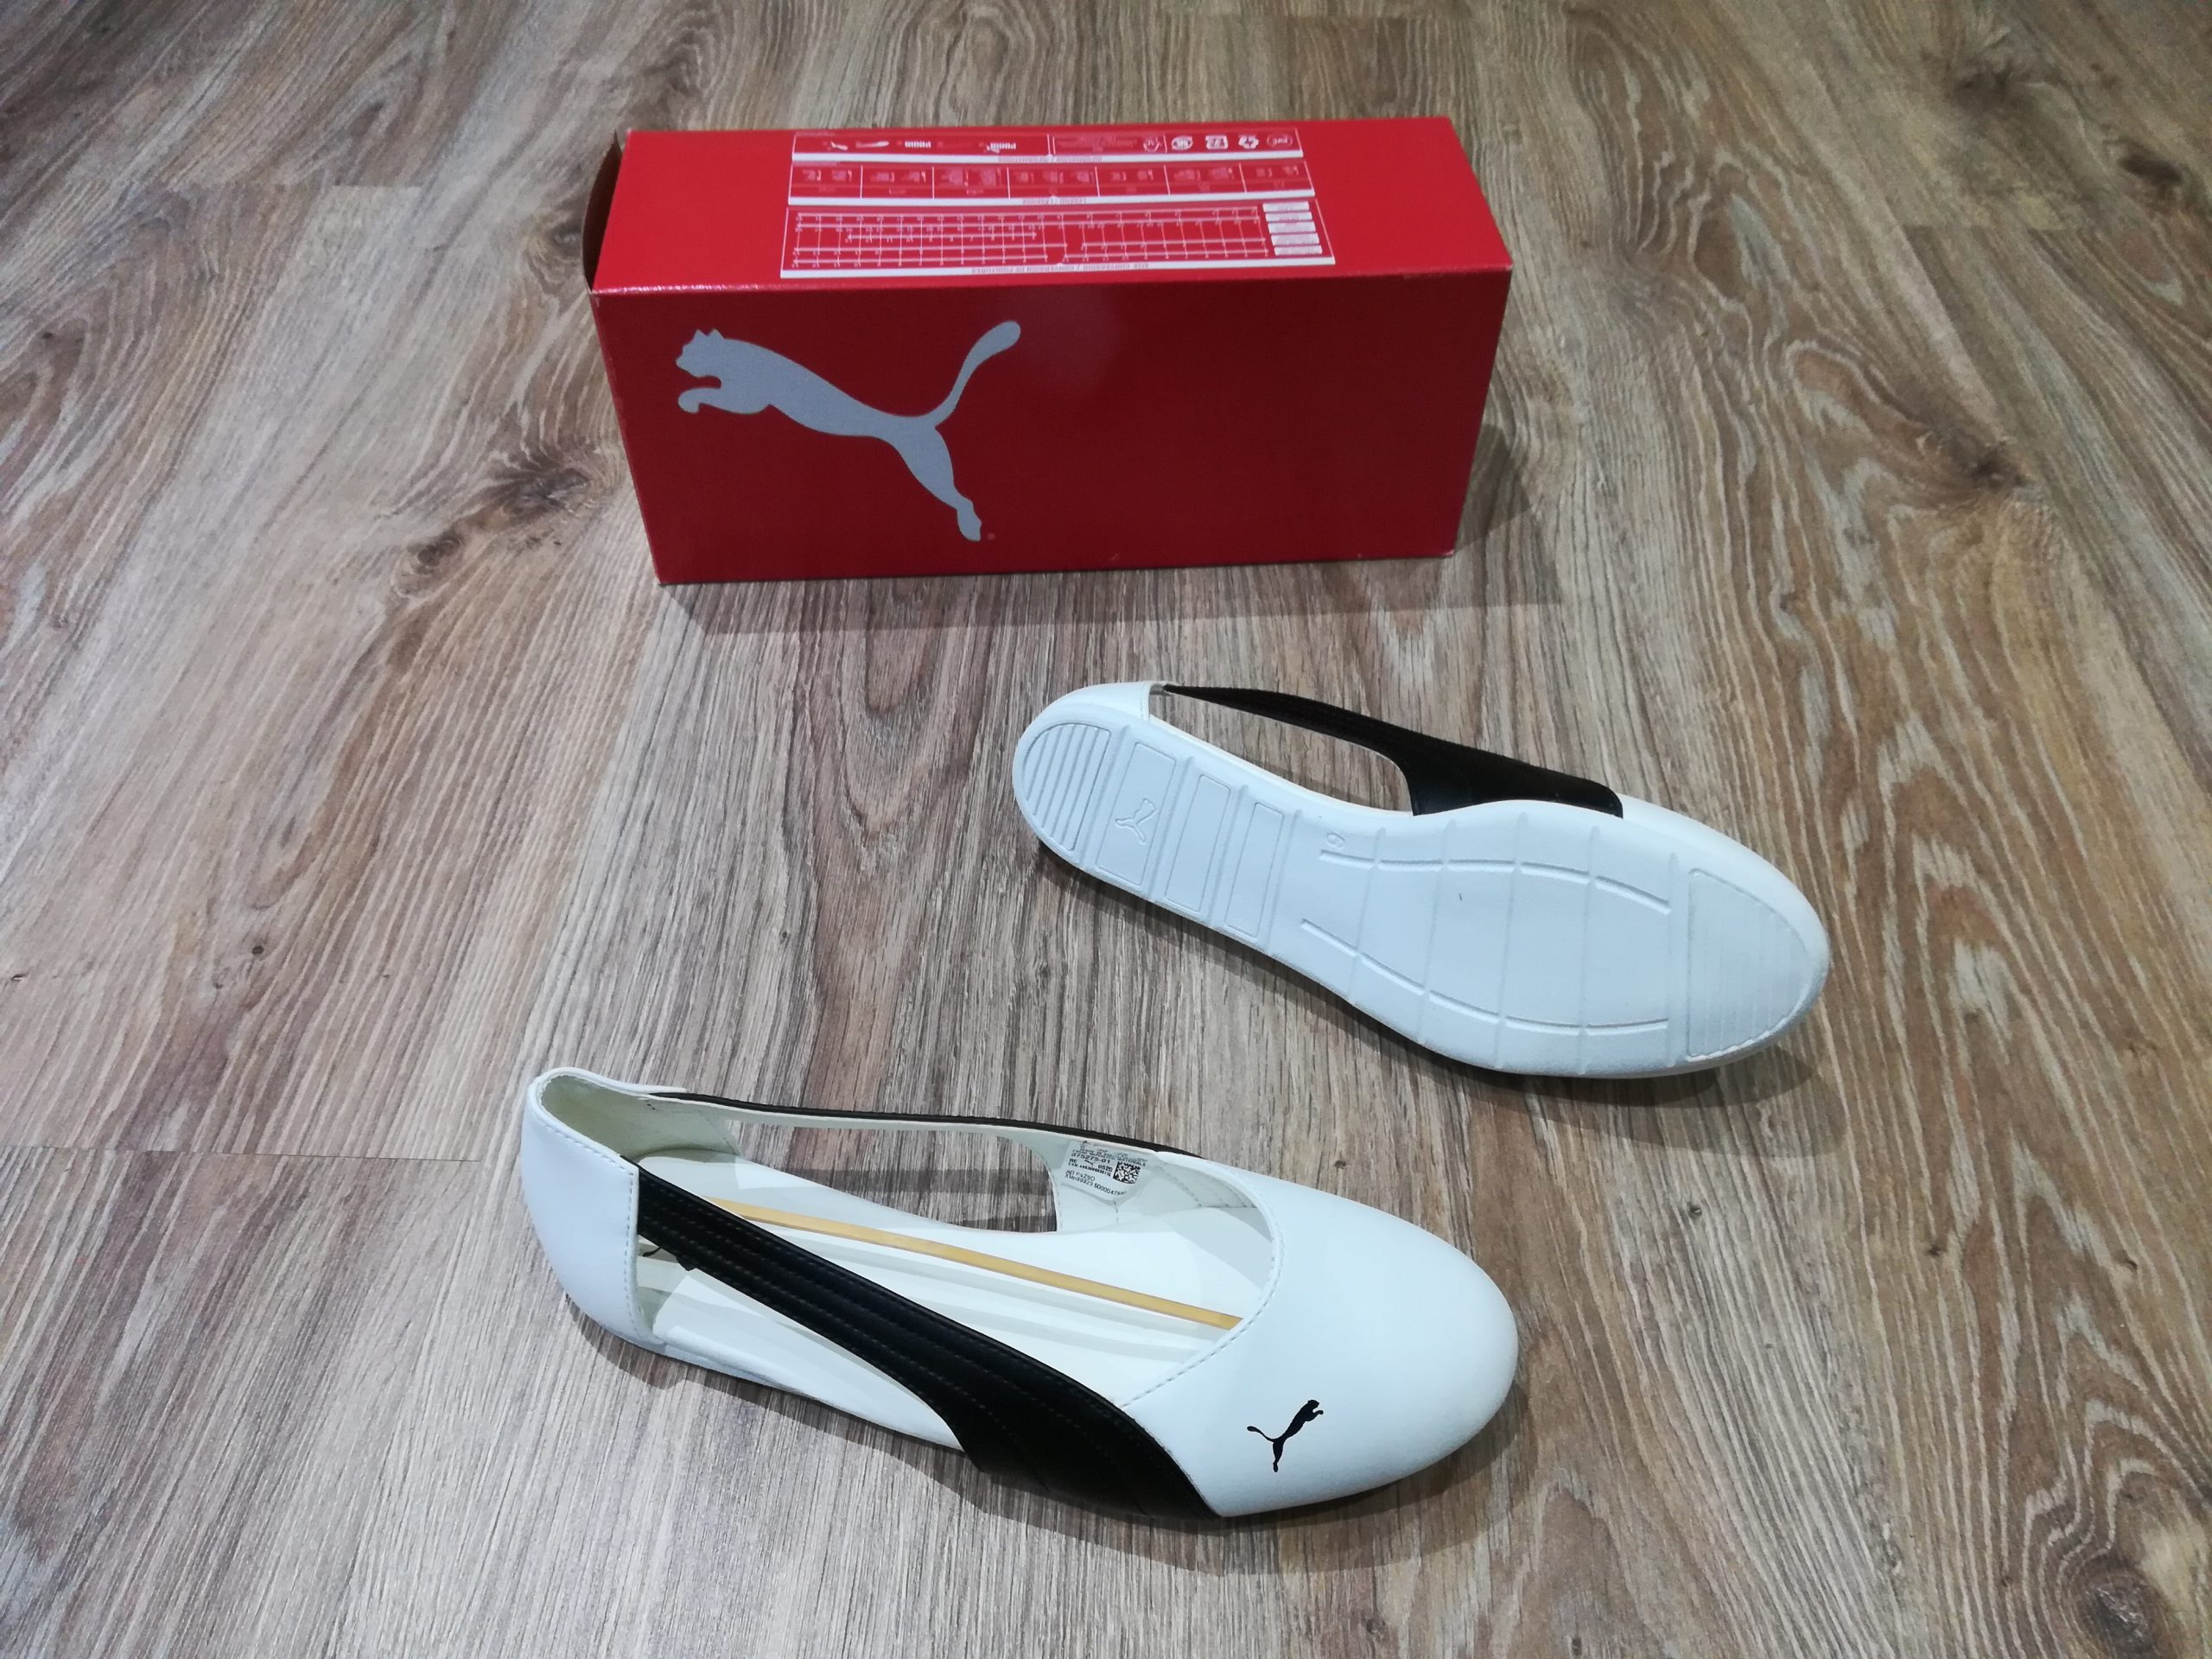 Puma basic Ballerina cut off pump white/black